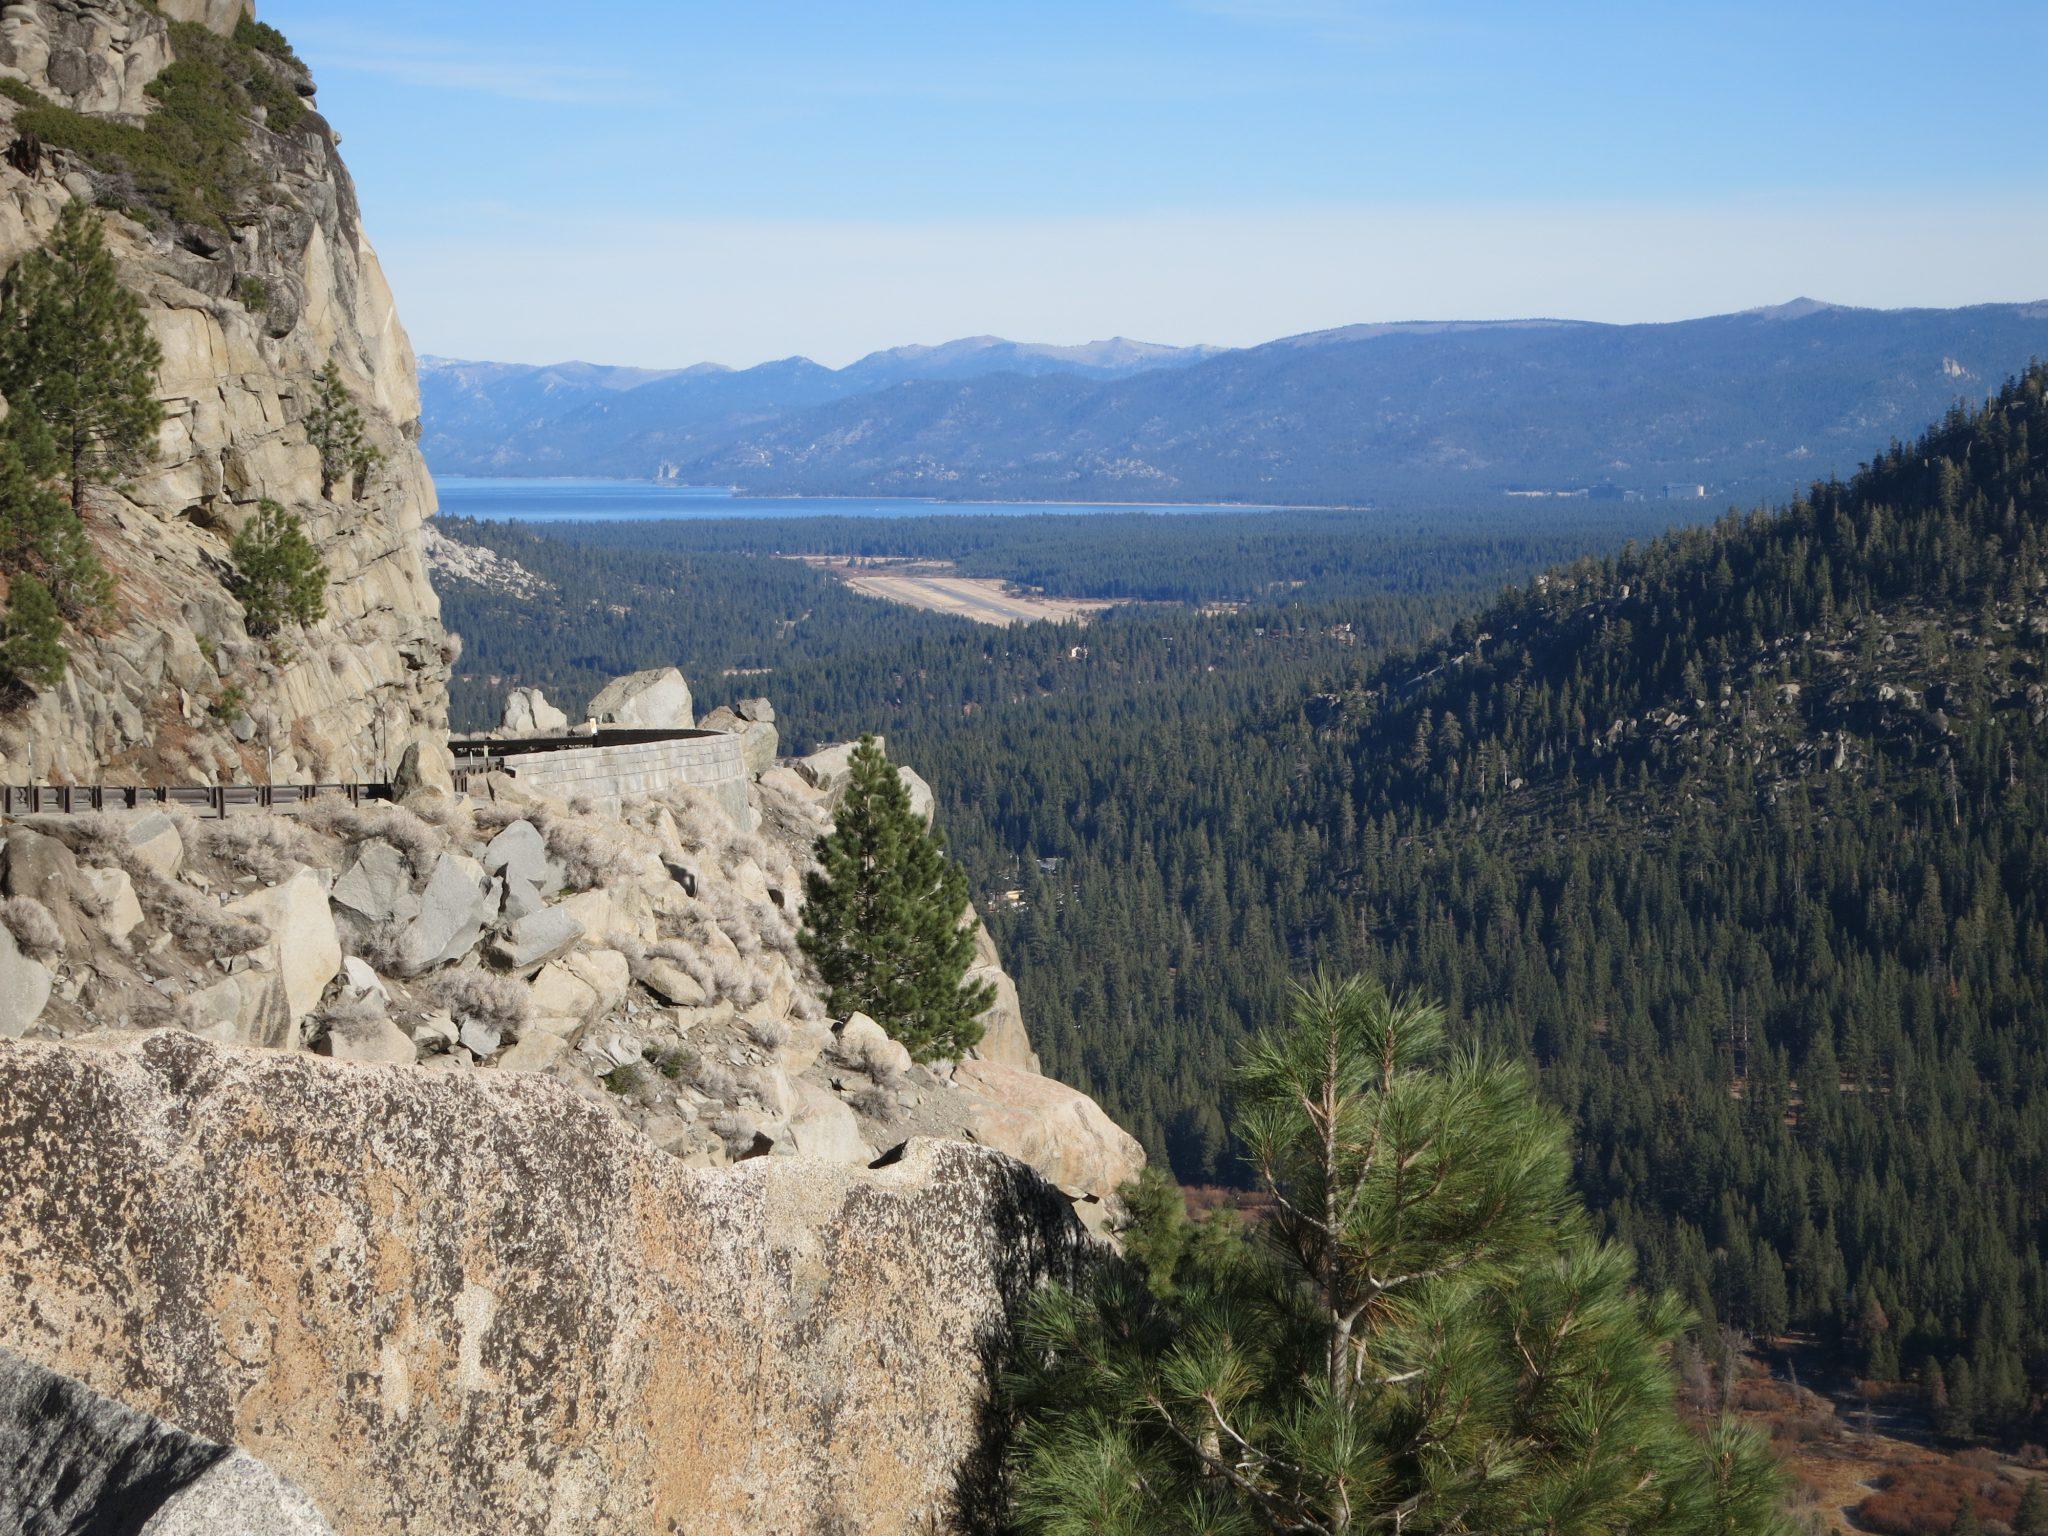 view over Lake Tahoe